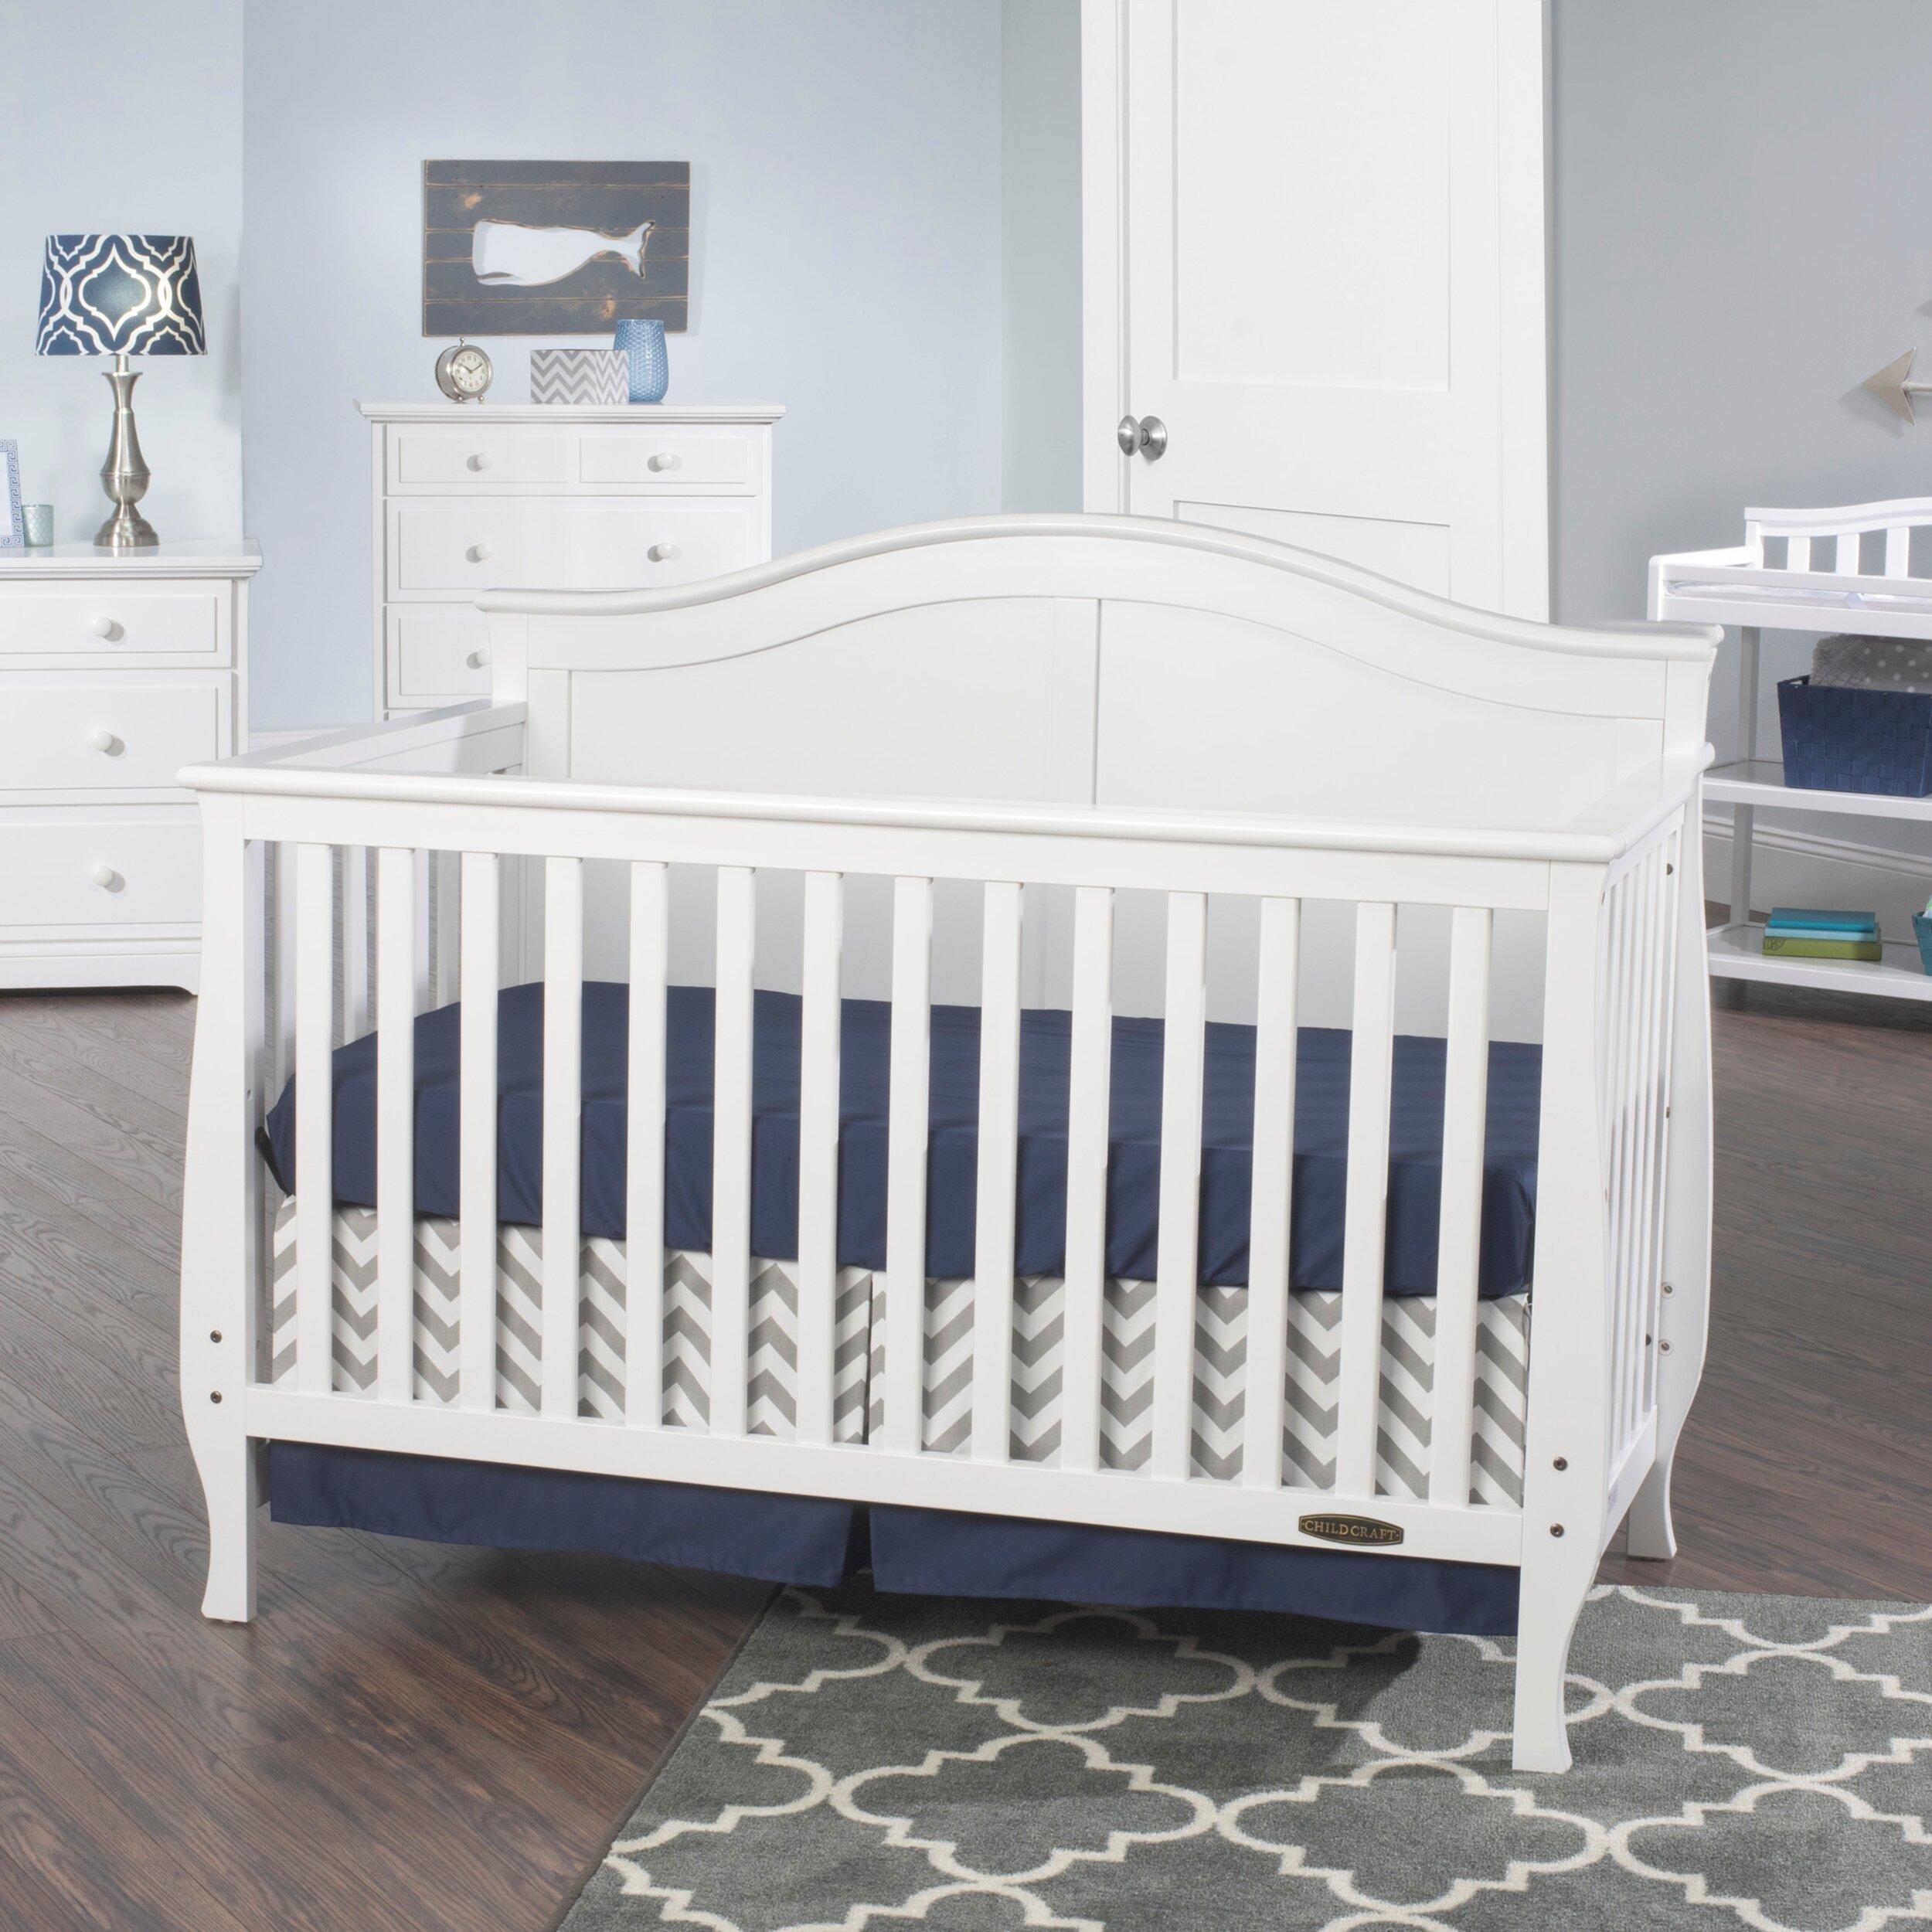 Wayfair   White Cribs You'll Love in 21